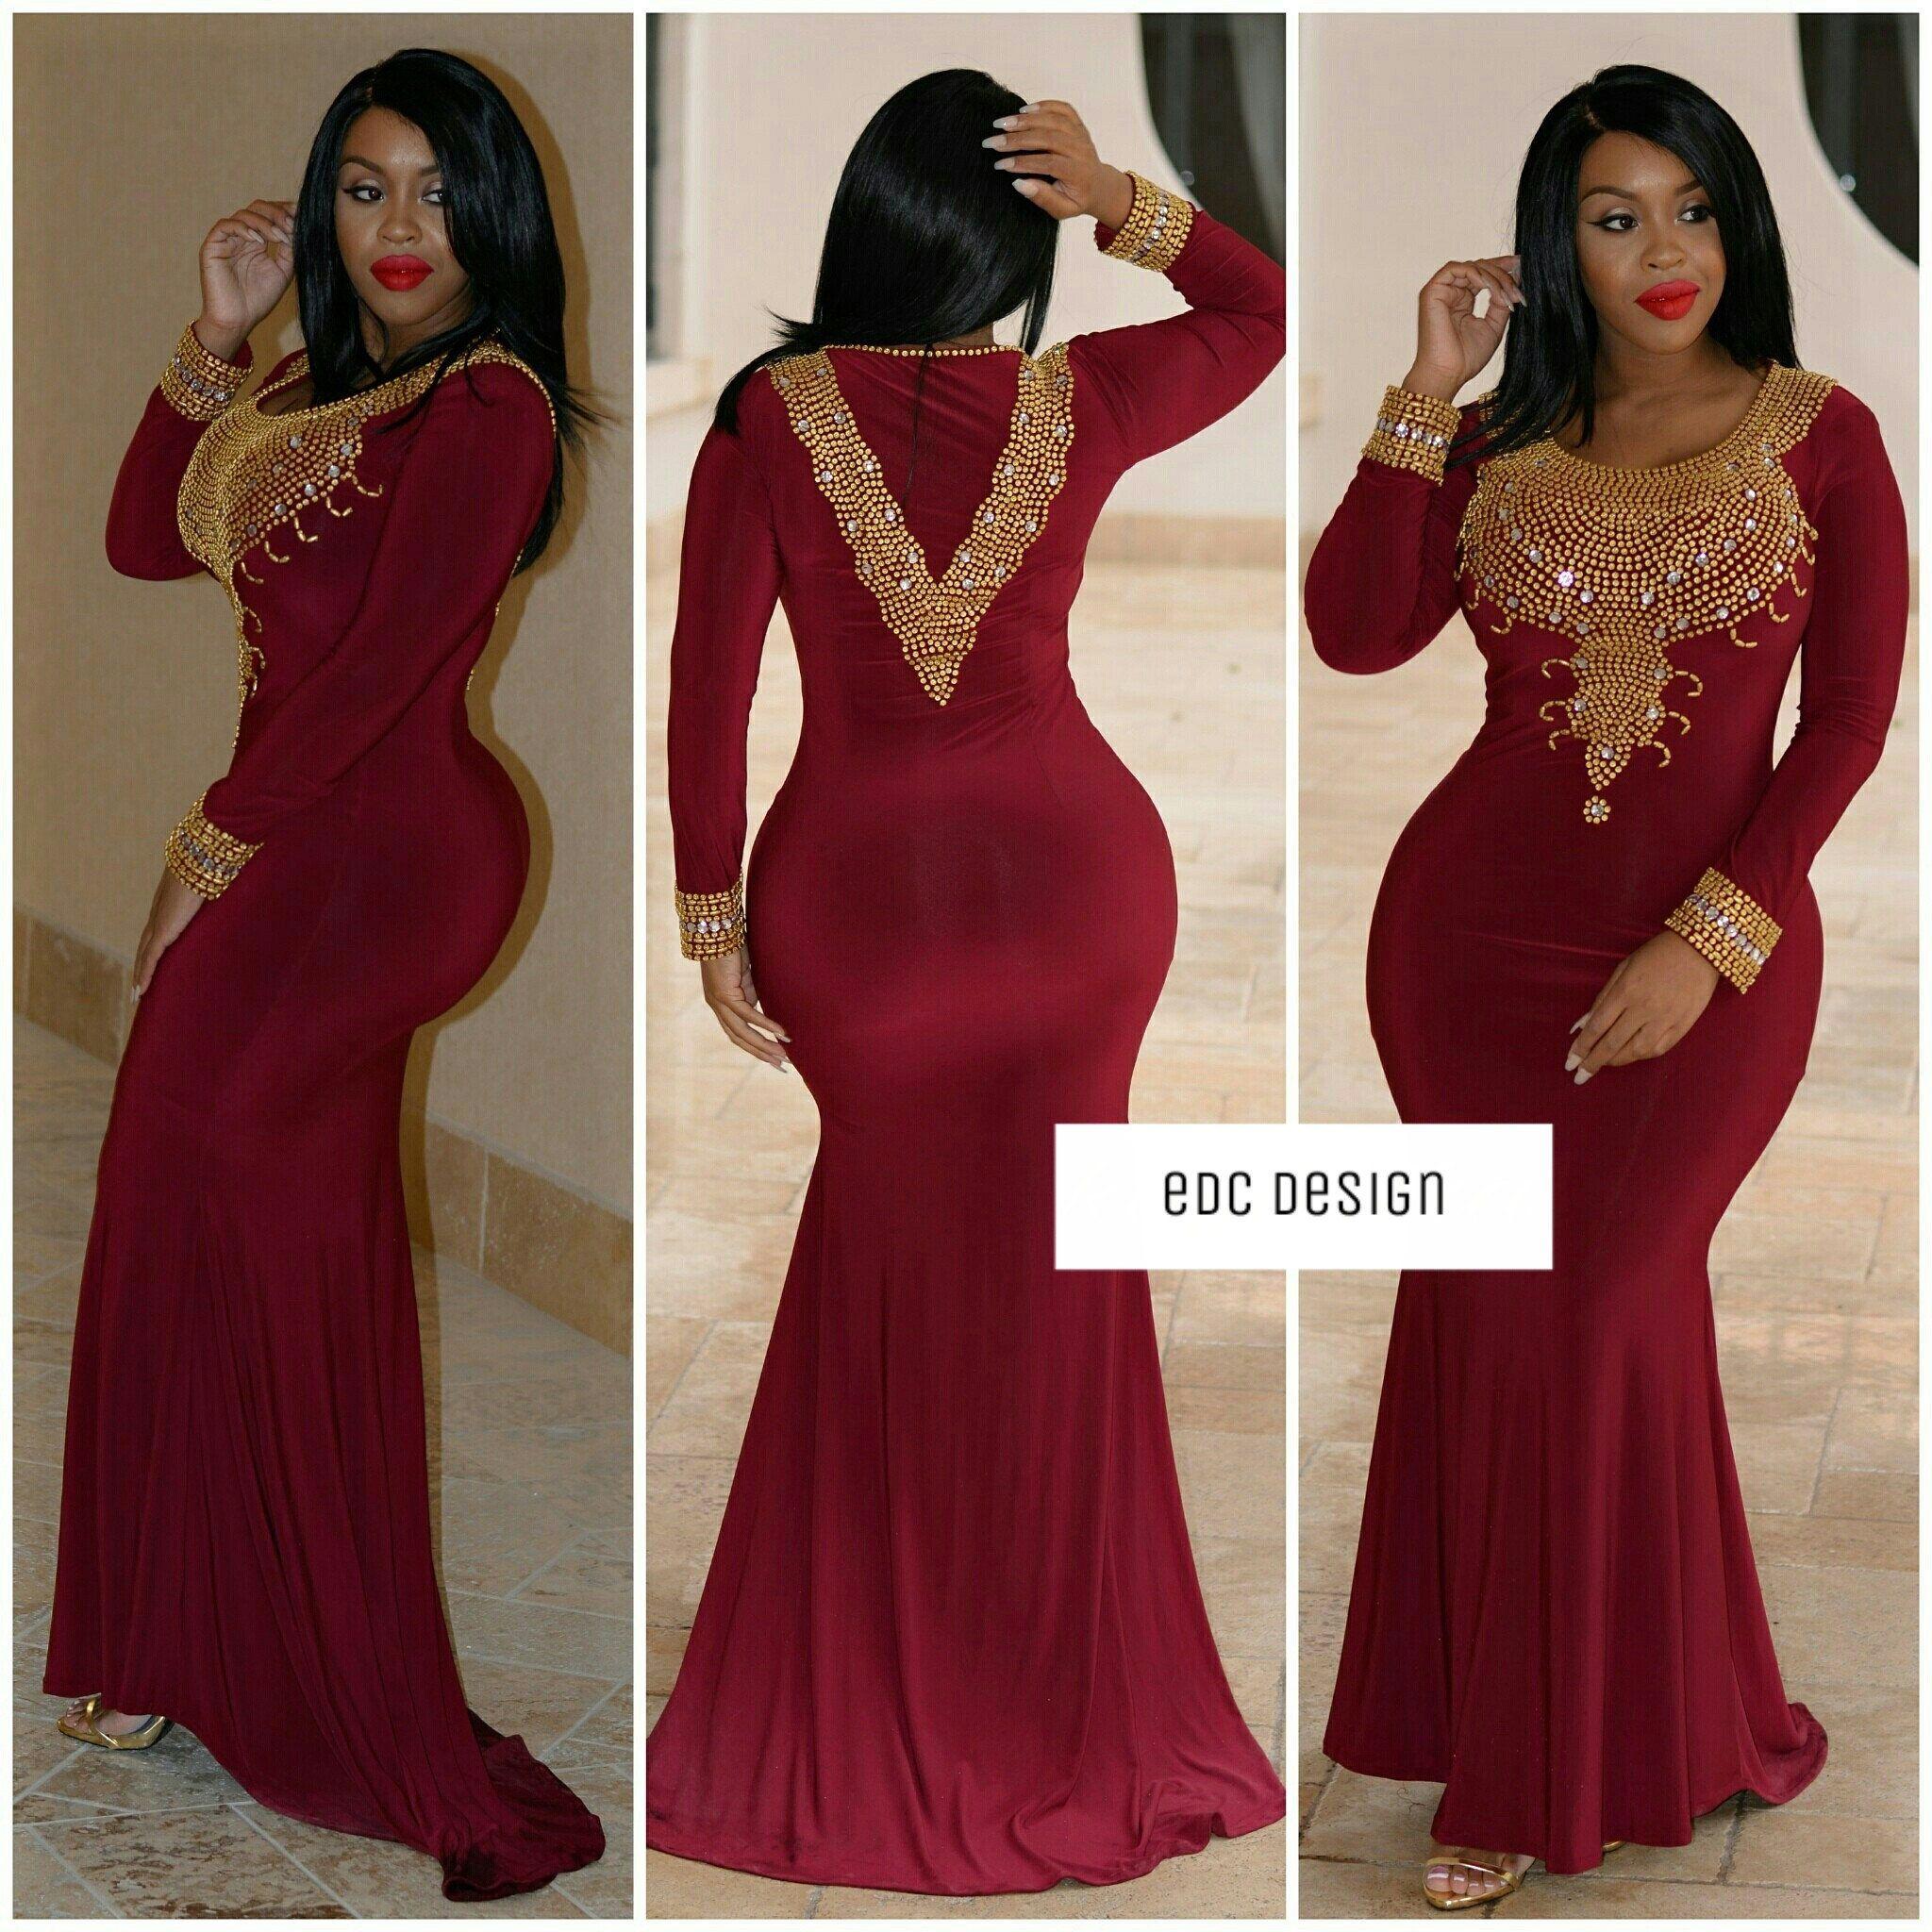 Amara Dress Dark Wine Color Kaftan Abaya Jumpsuit Etsy In 2020 Dresses Fashion African Fashion Dresses